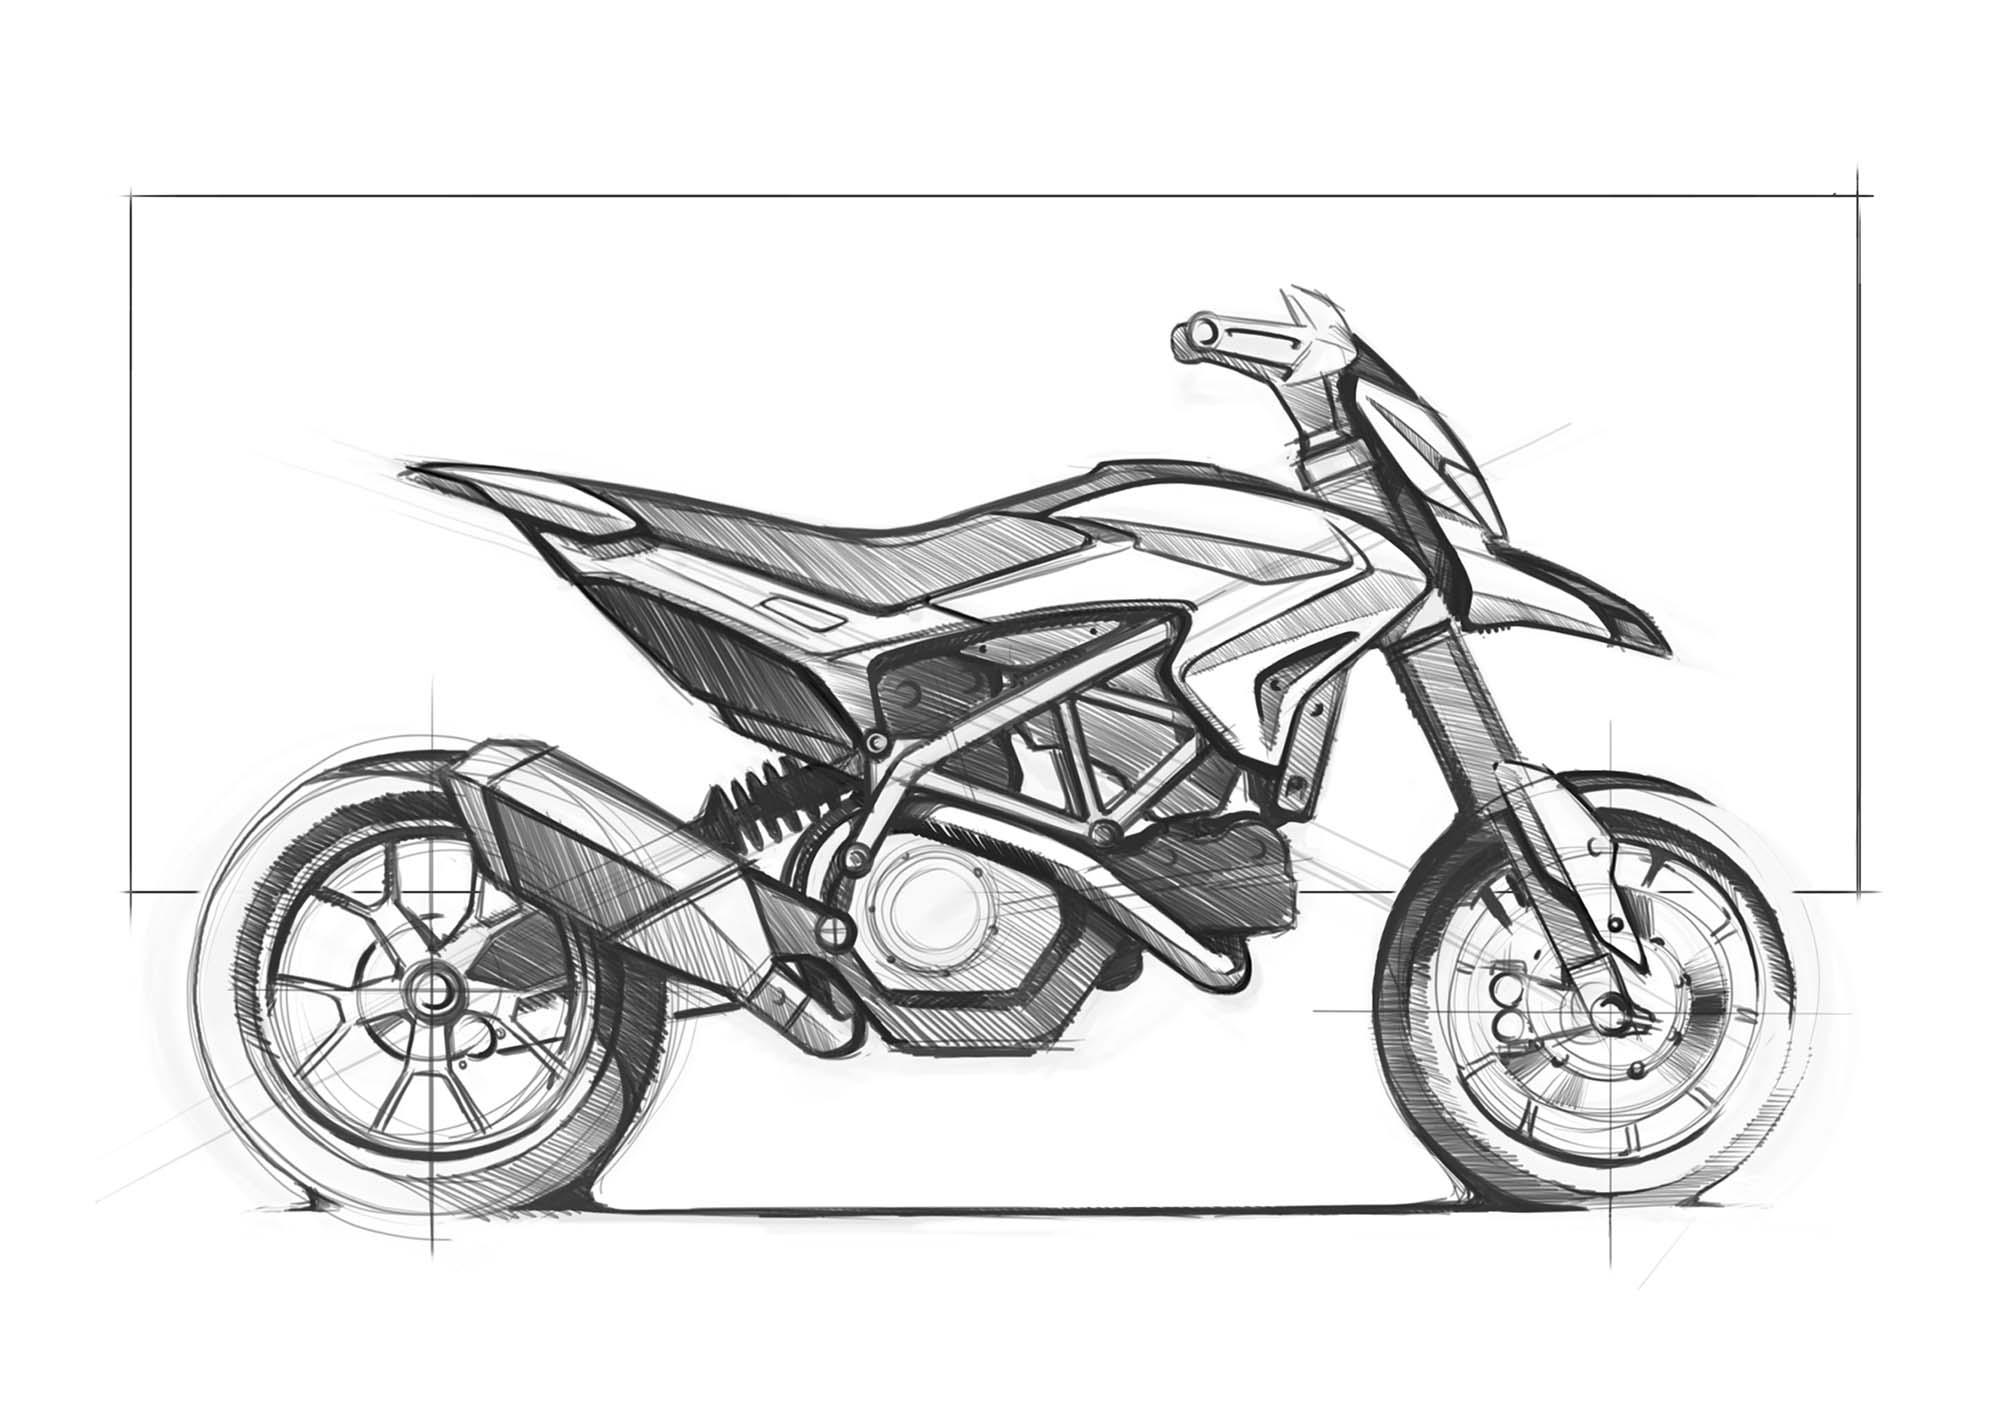 Ducati Hypermotard Design 05